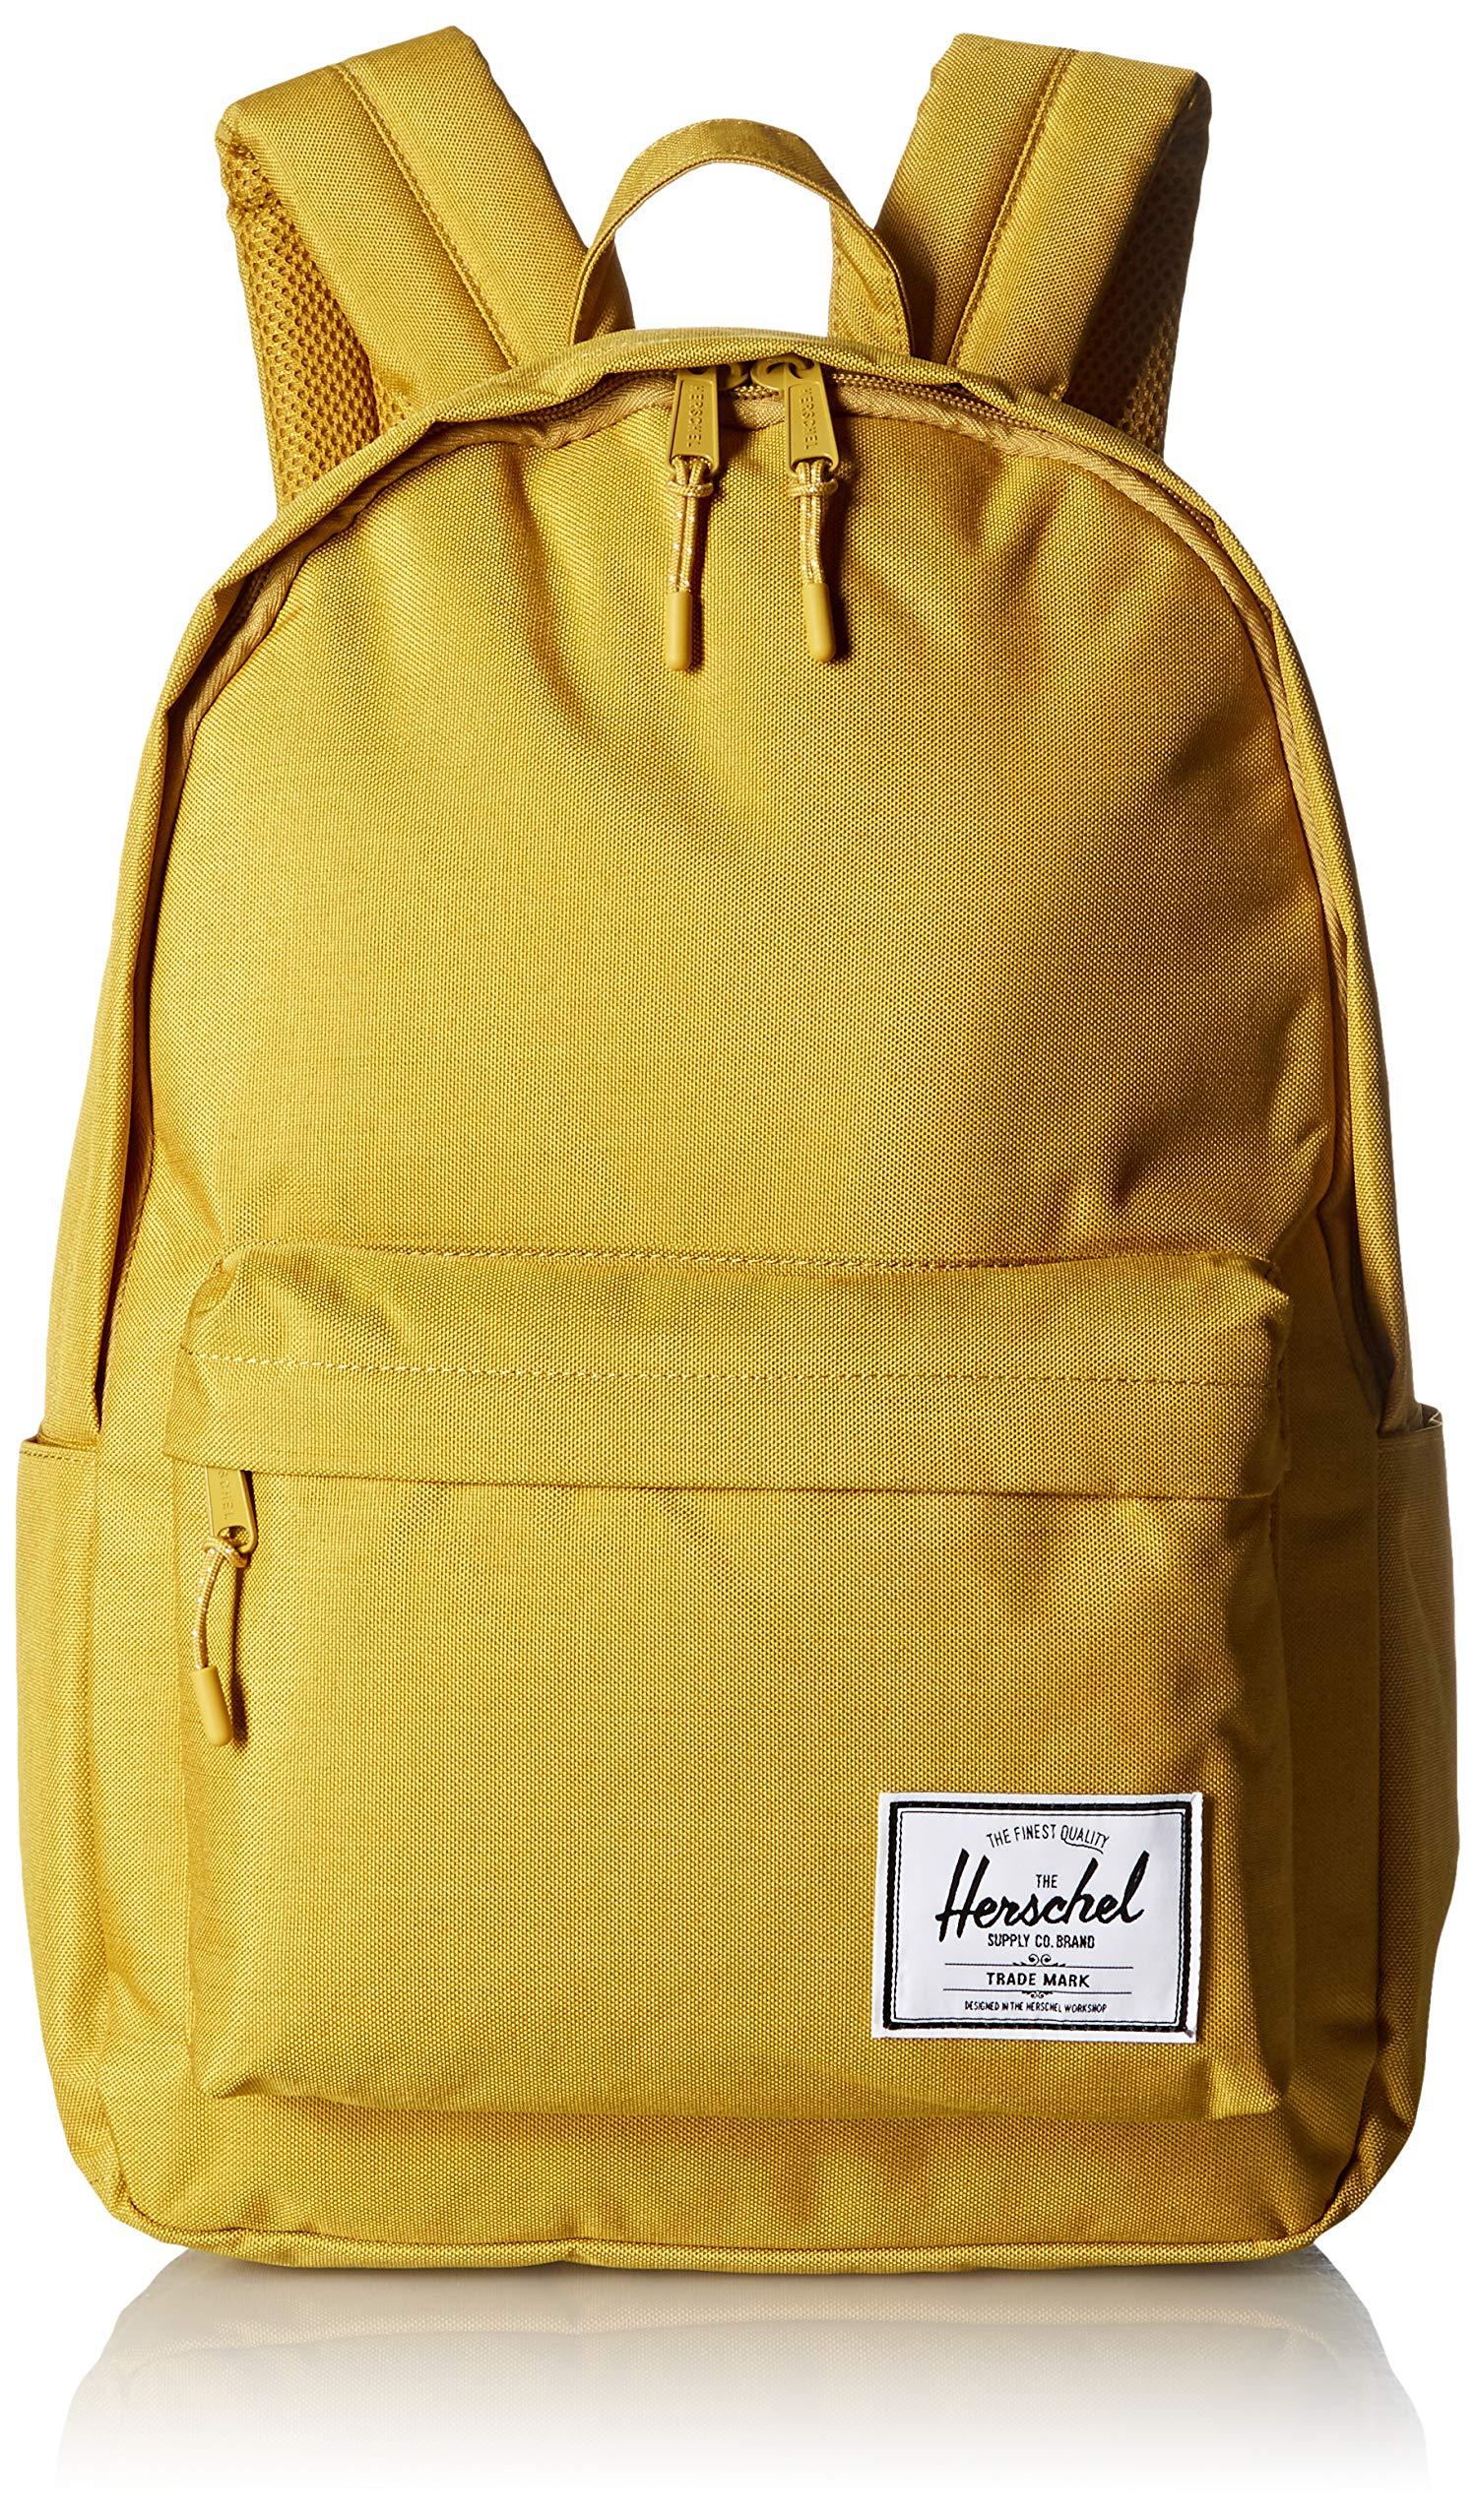 Herschel Classic X-Large Backpack, Arrowwood Crosshatch, One Size by Herschel